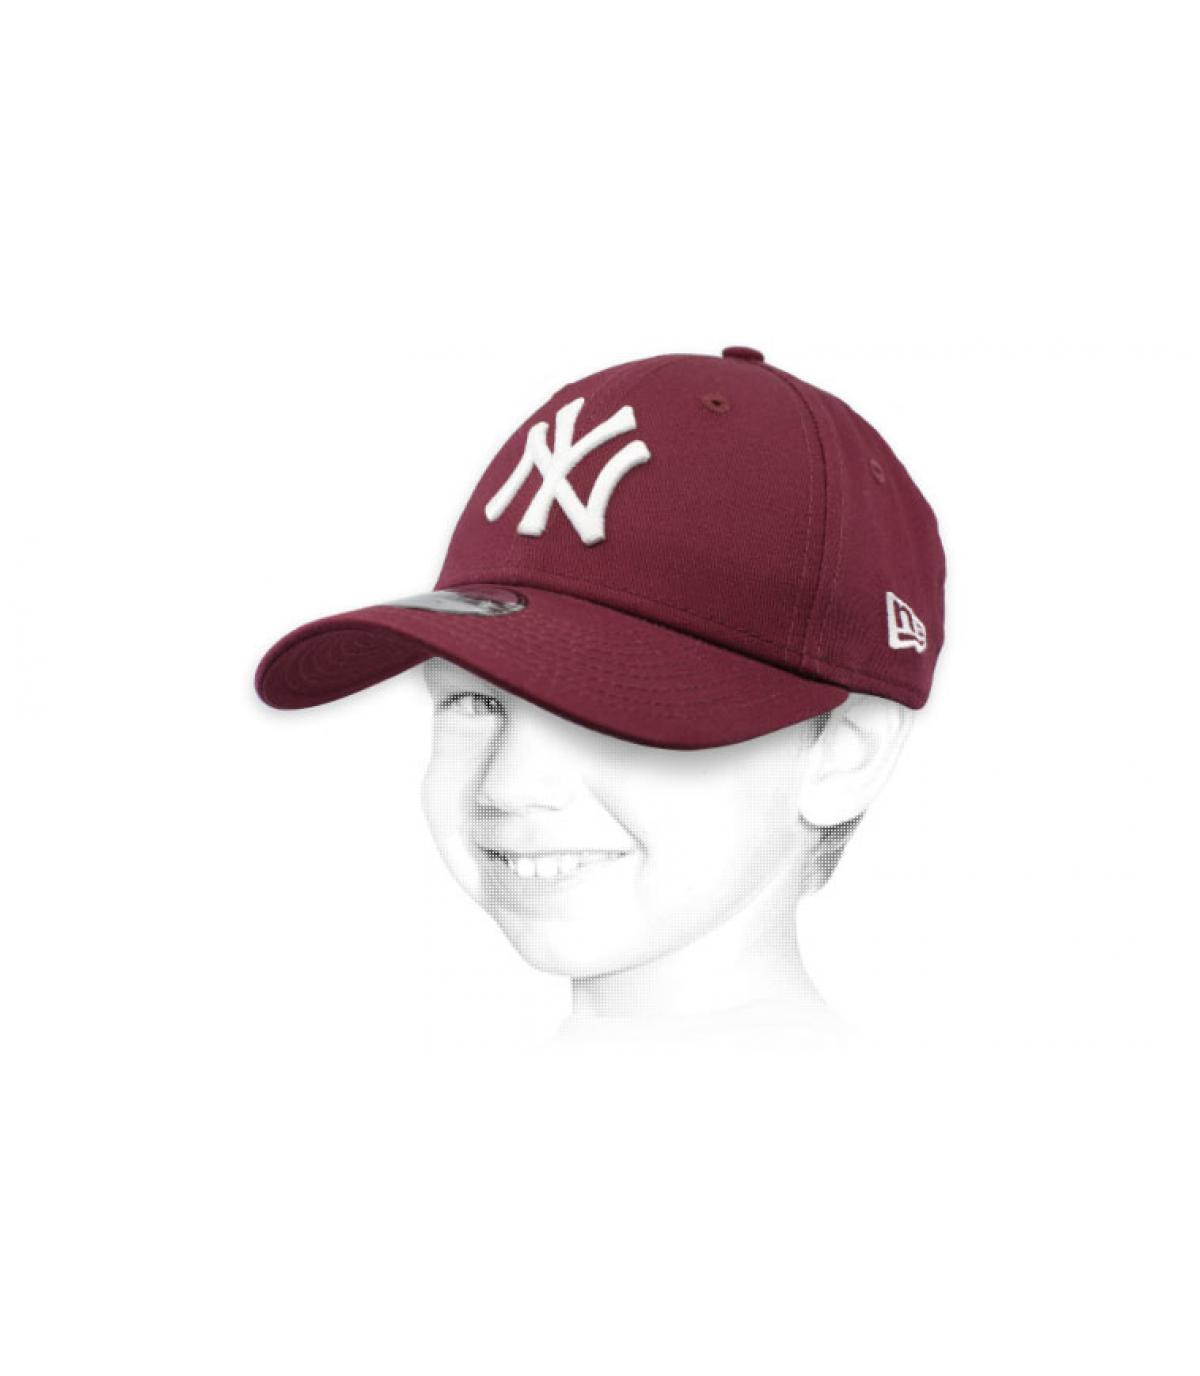 Kinder Cap NY violett